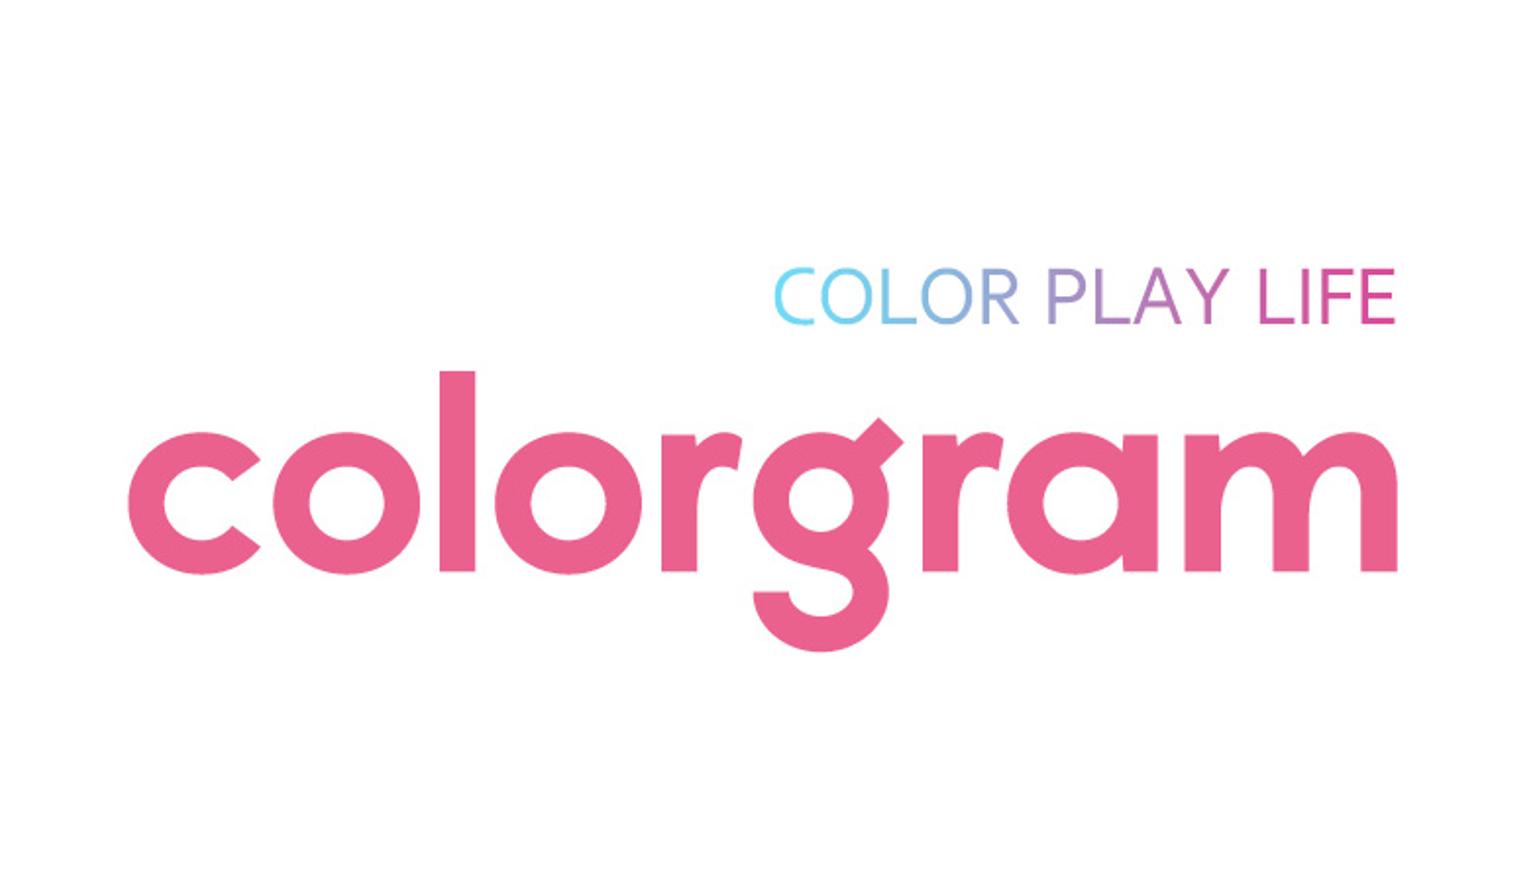 colorgram_logo_4.png